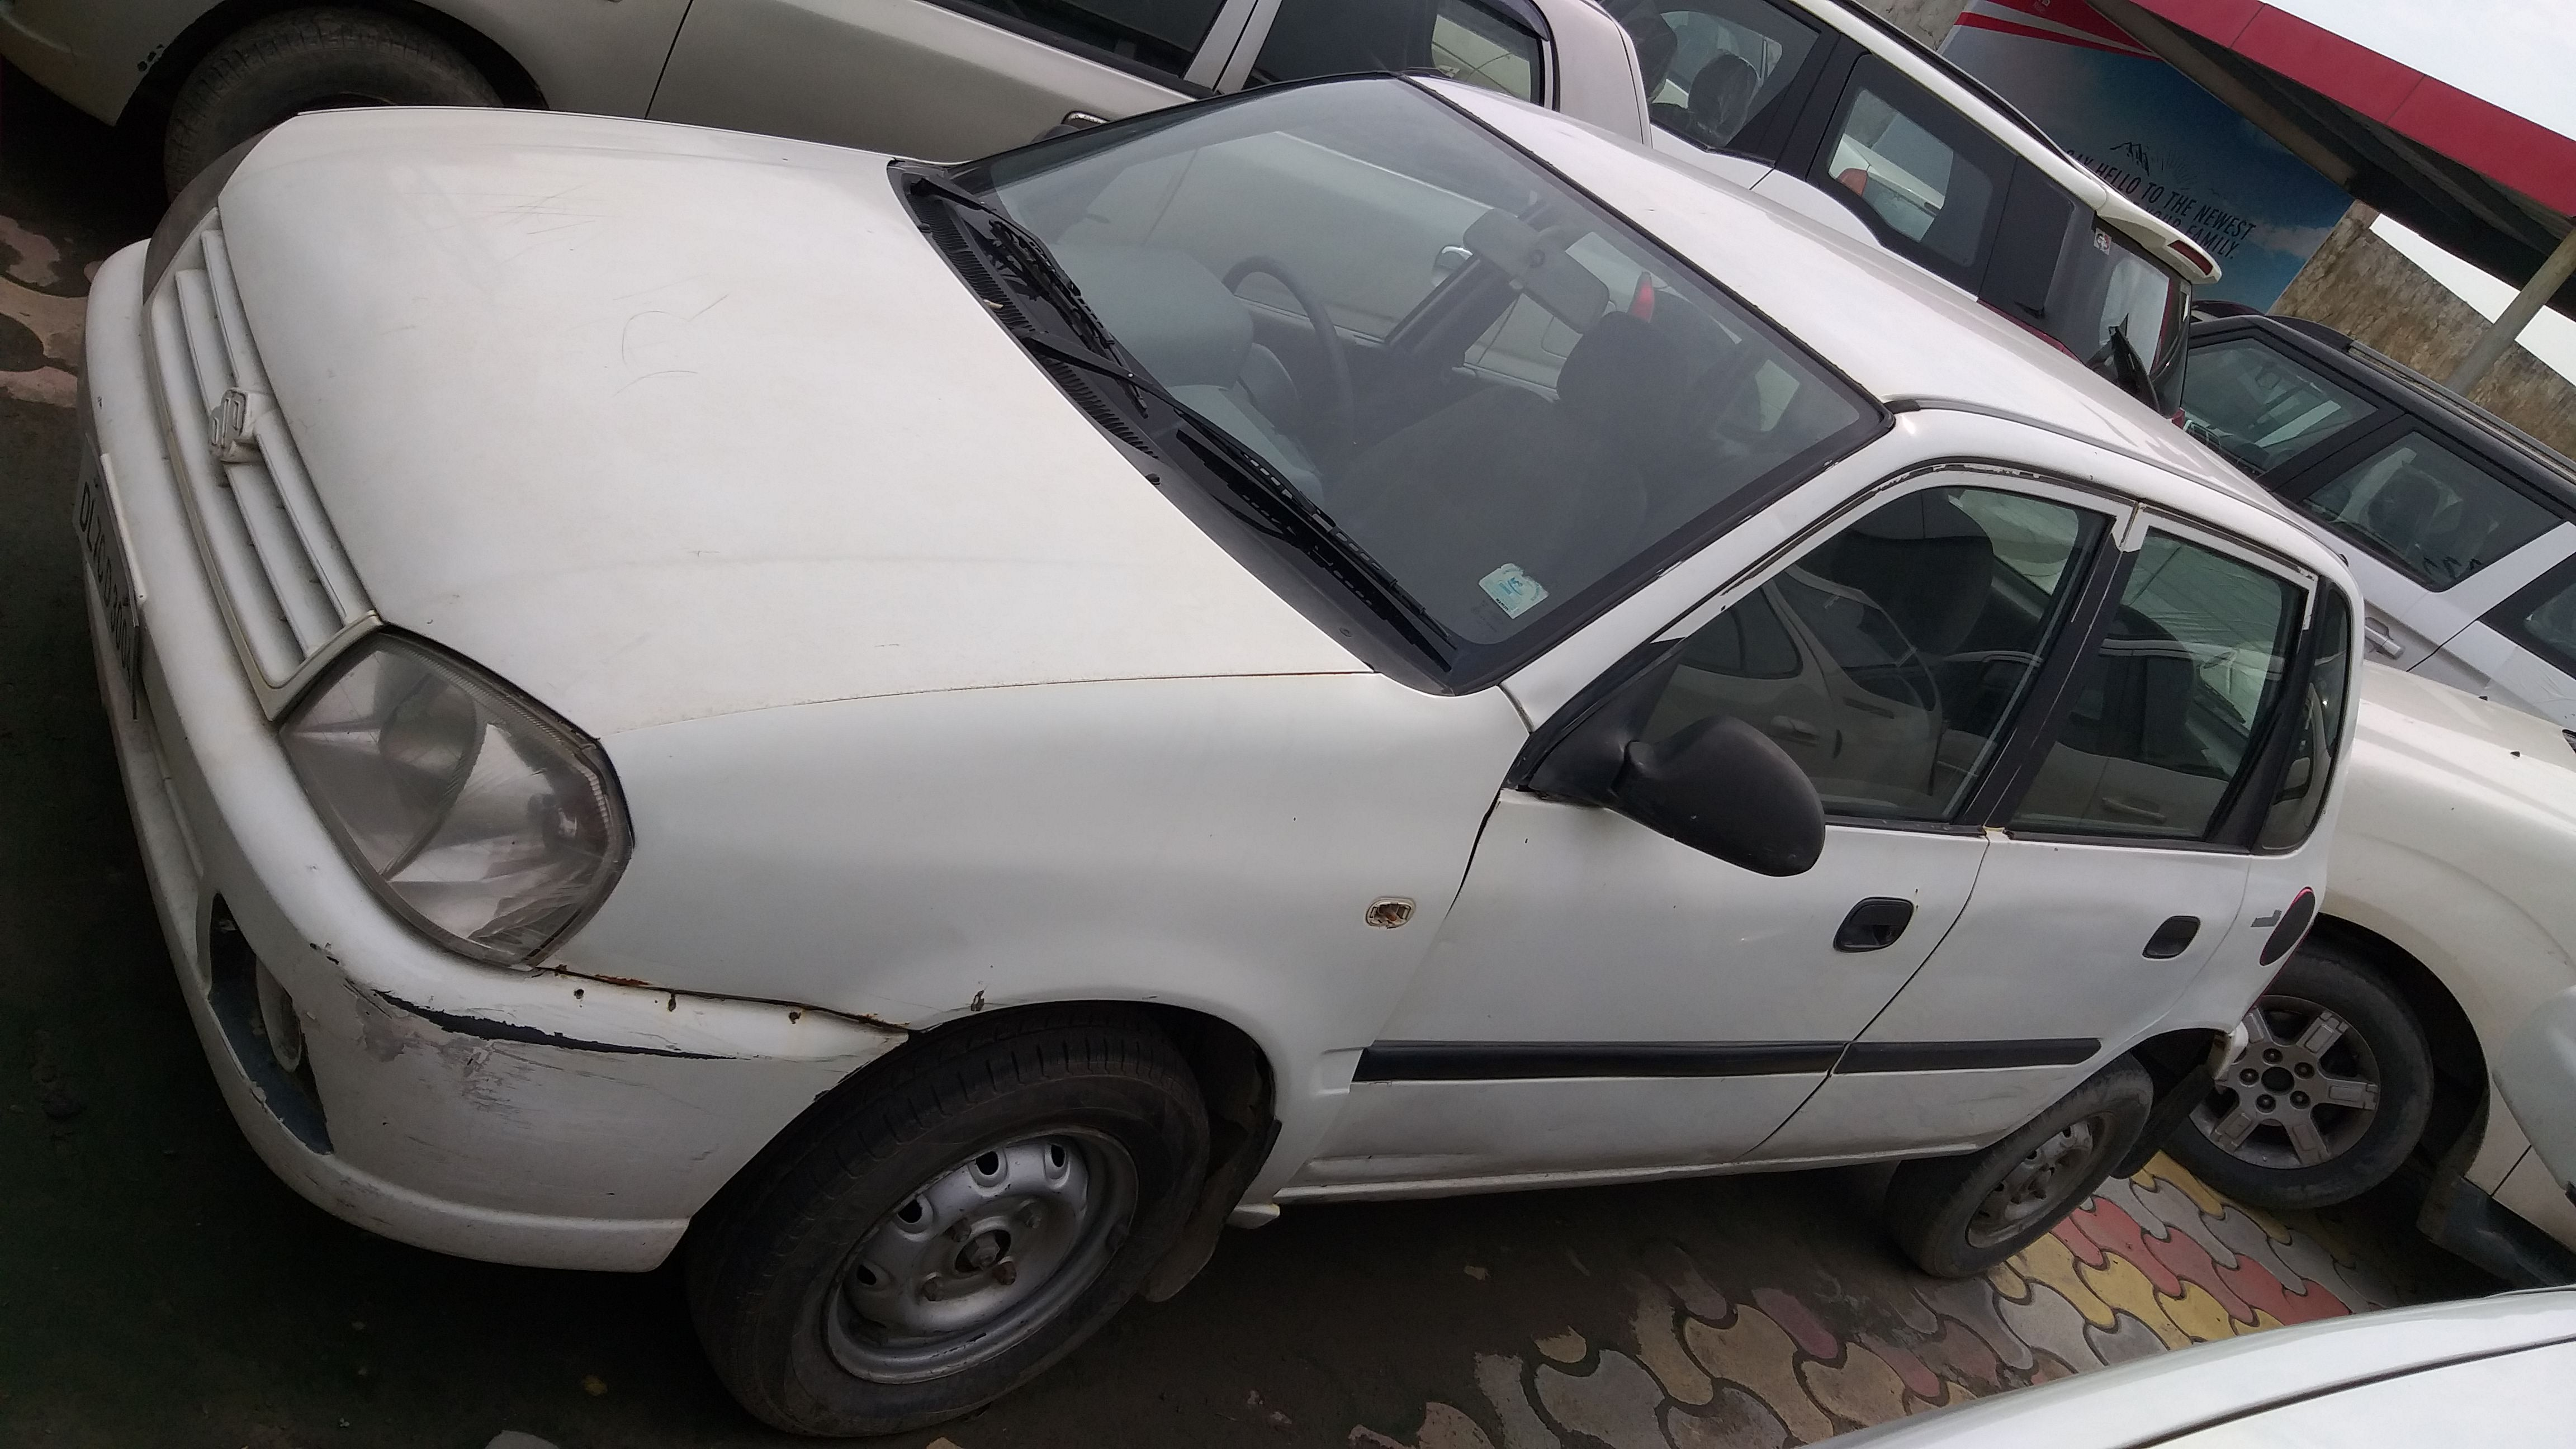 2004 Used Maruti Suzuki Zen VXI